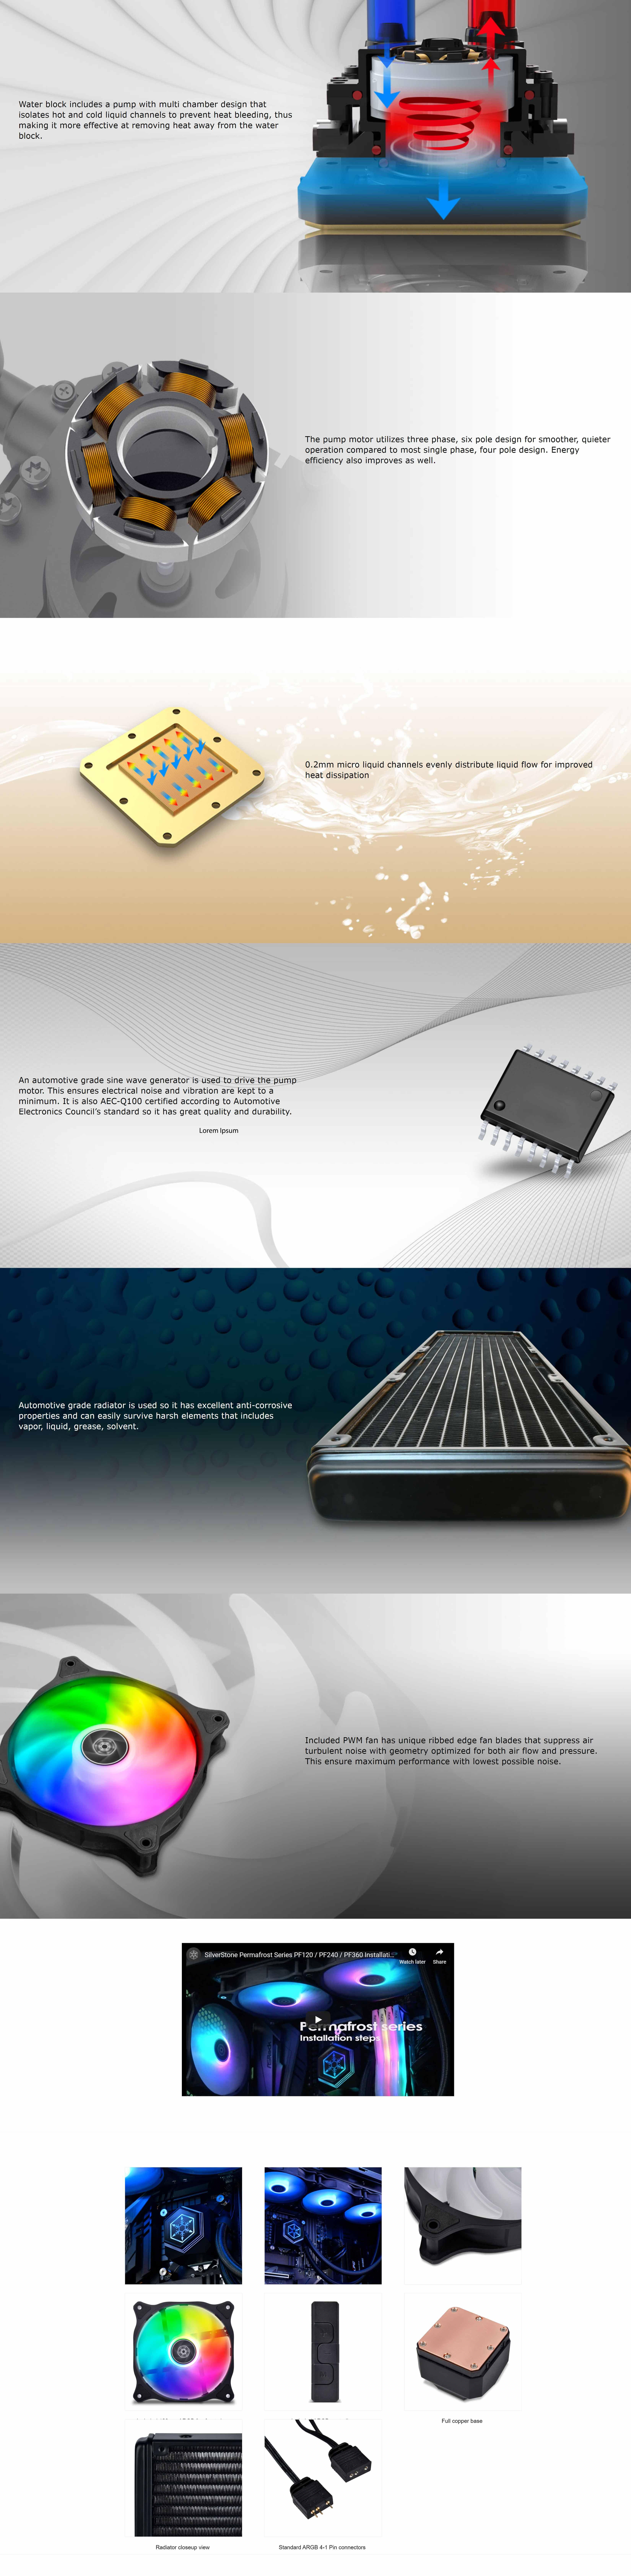 screencapture-silverstonetek-product-php-2020-01-09-12_52_22.jpg